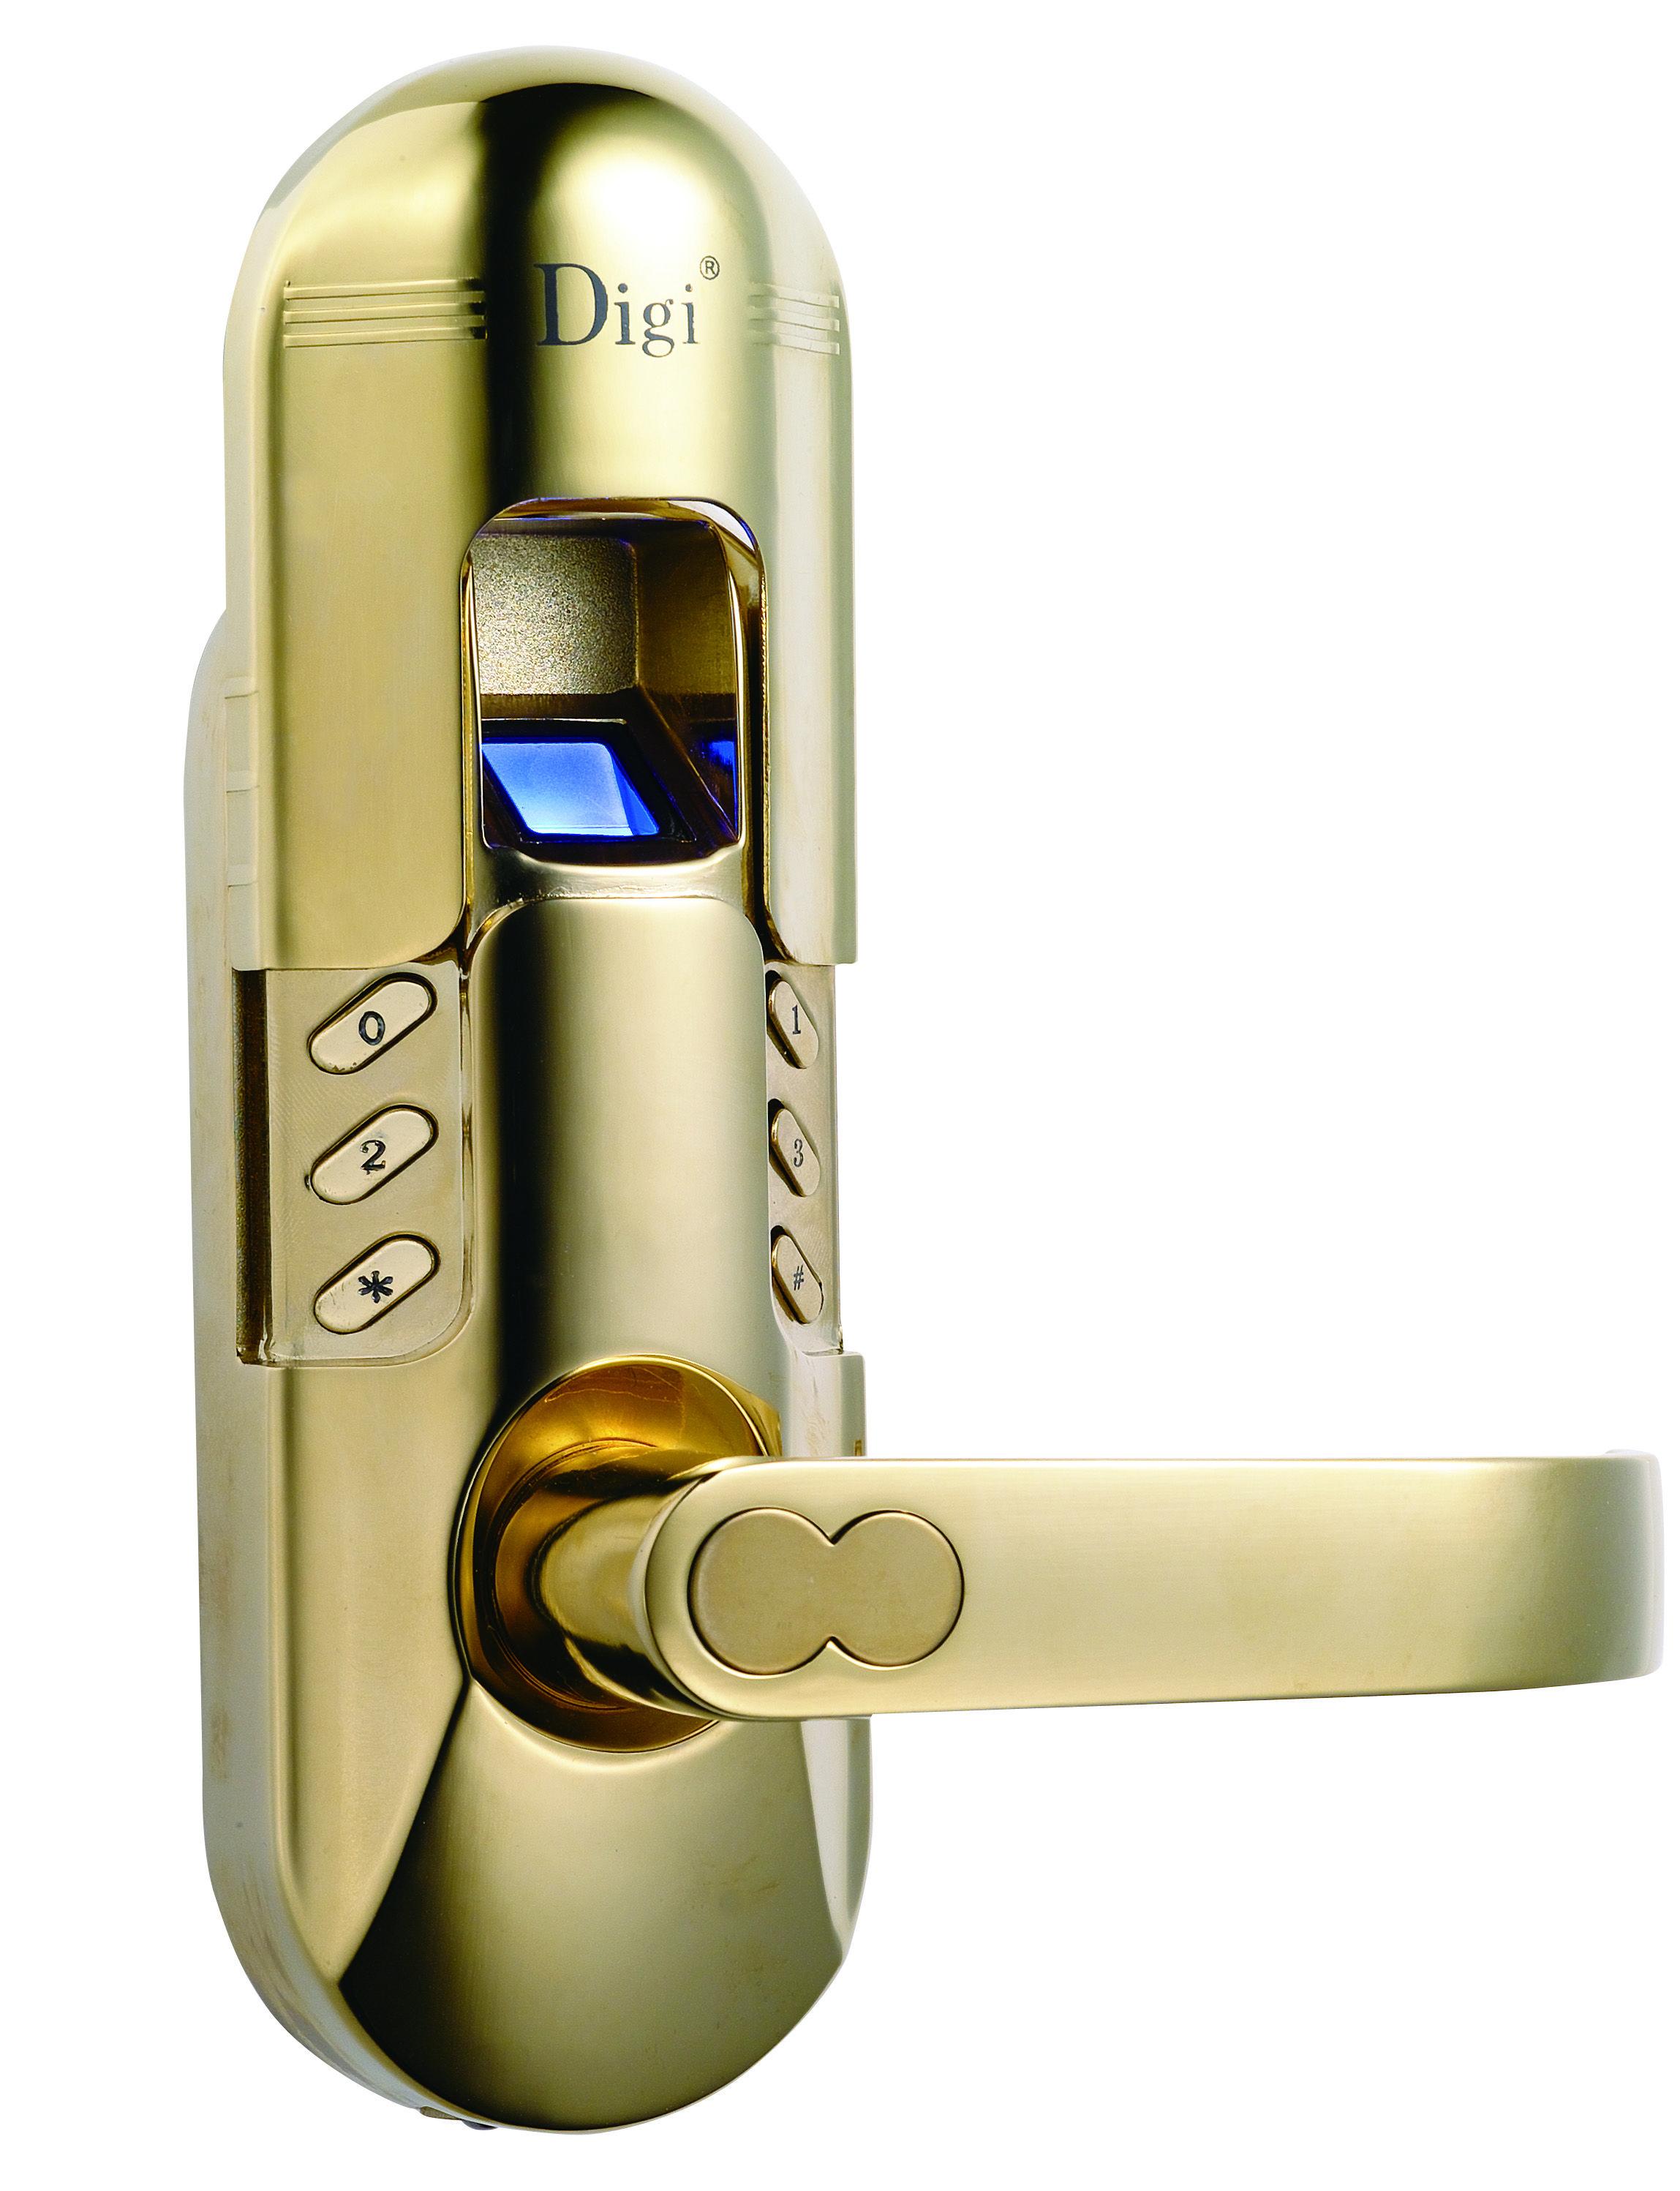 pvd goldspecial color requirement accepted fingerprint door lock keypad lock digi